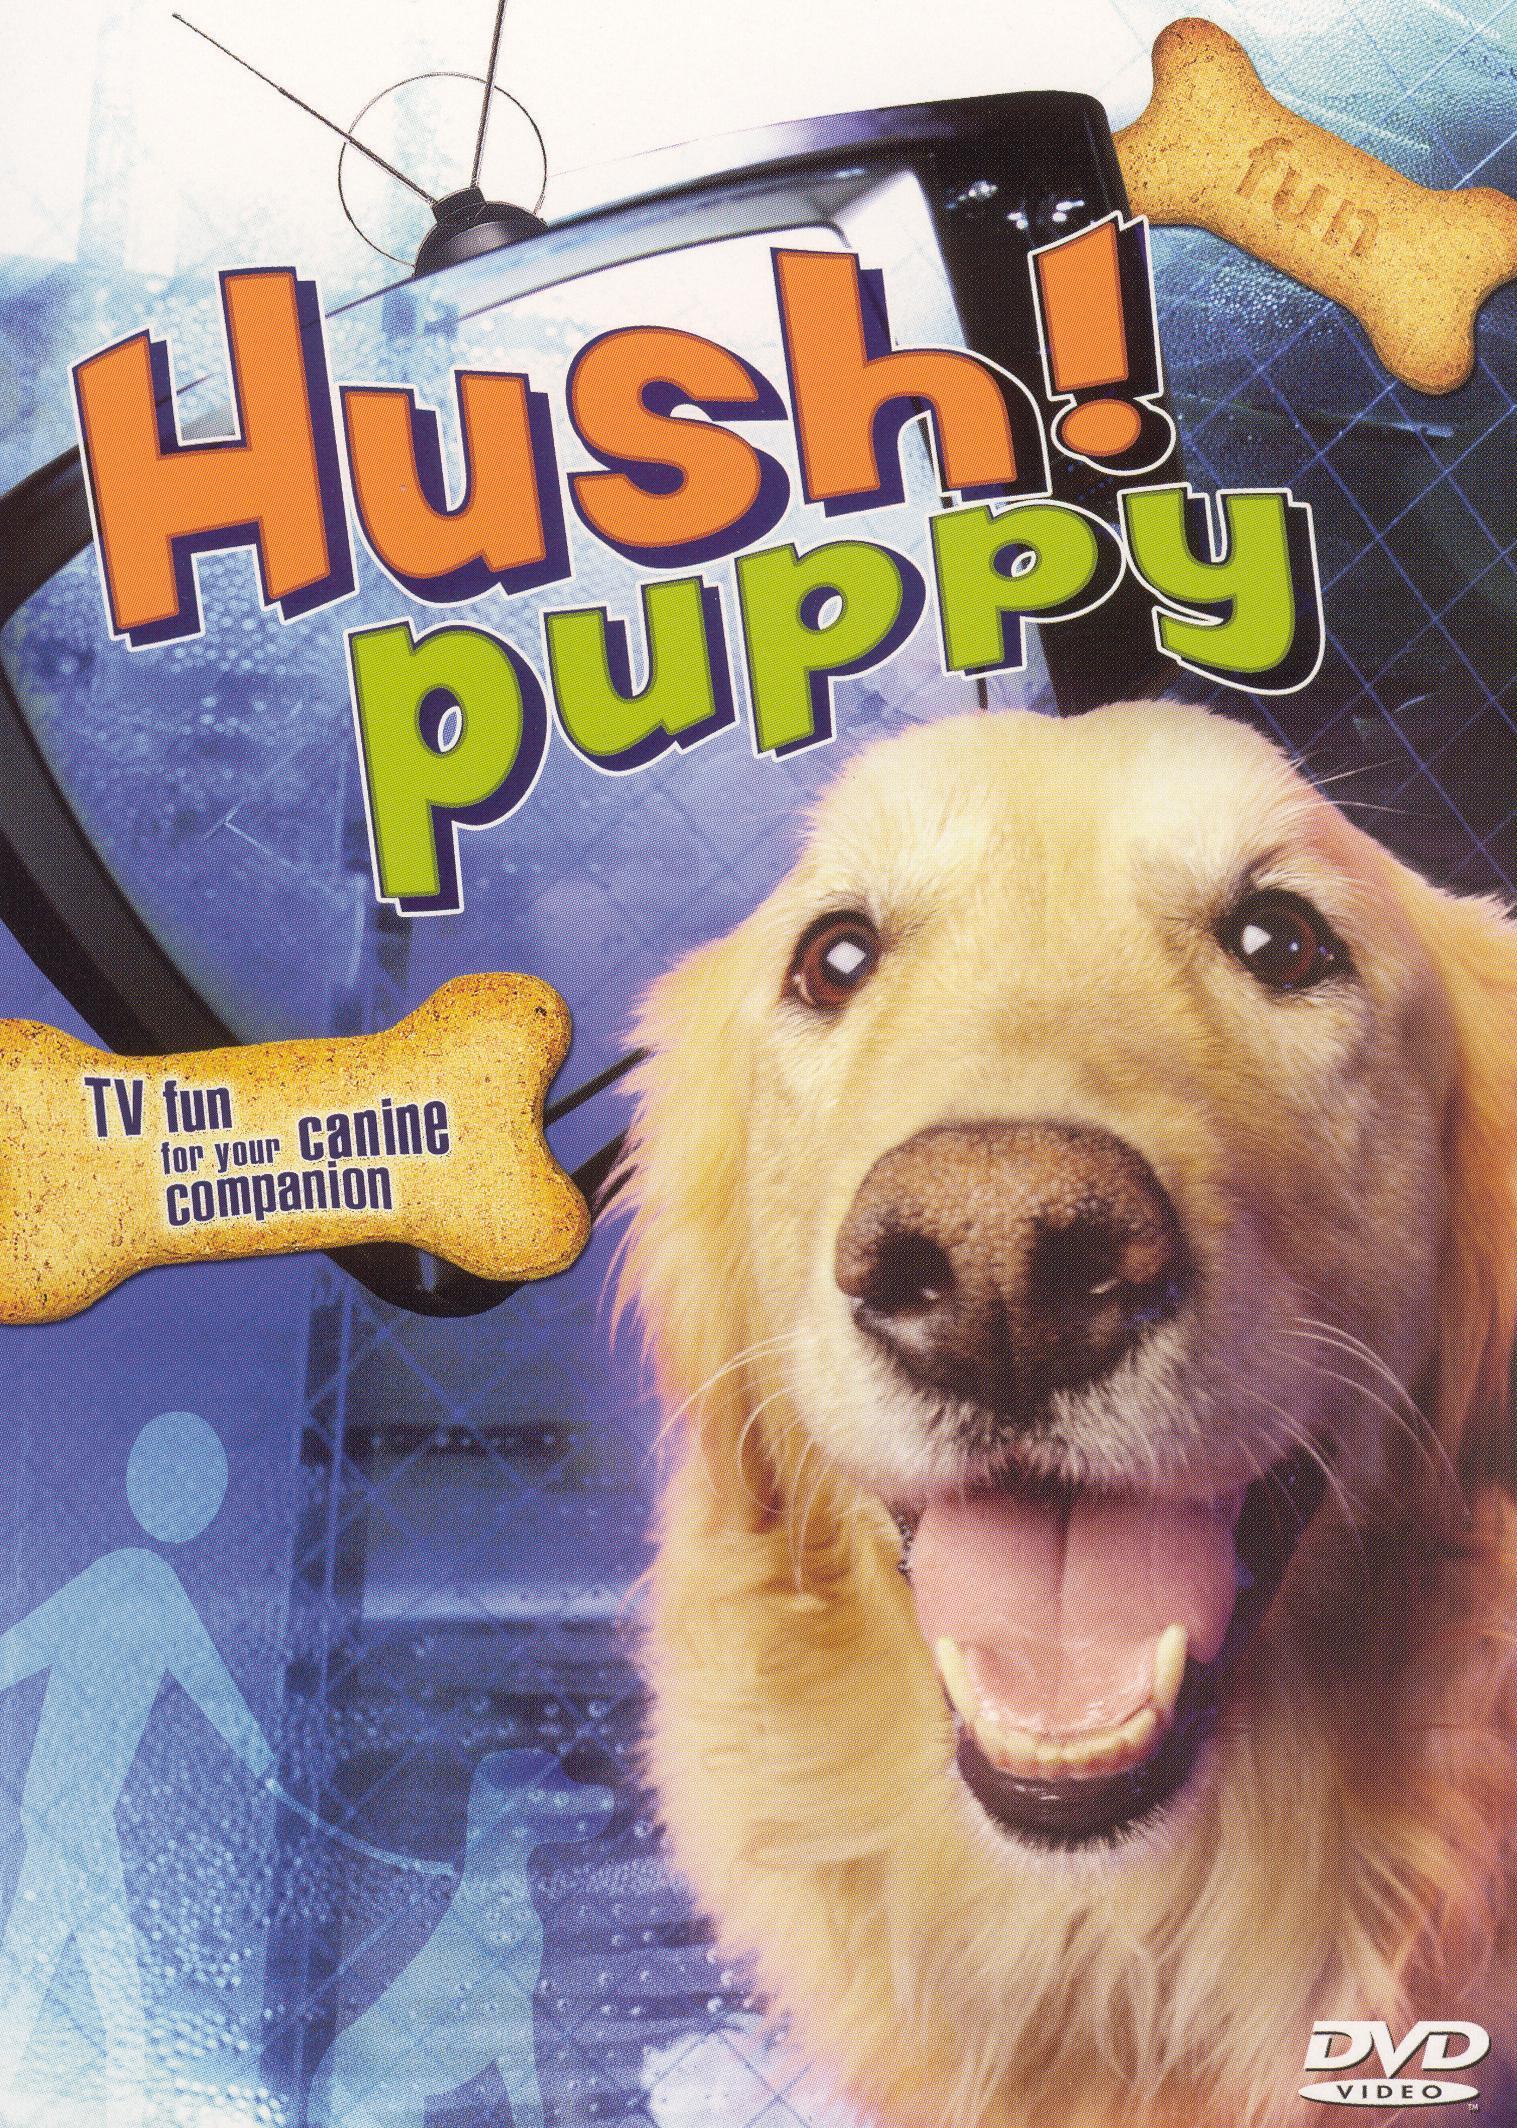 Hush! Puppy